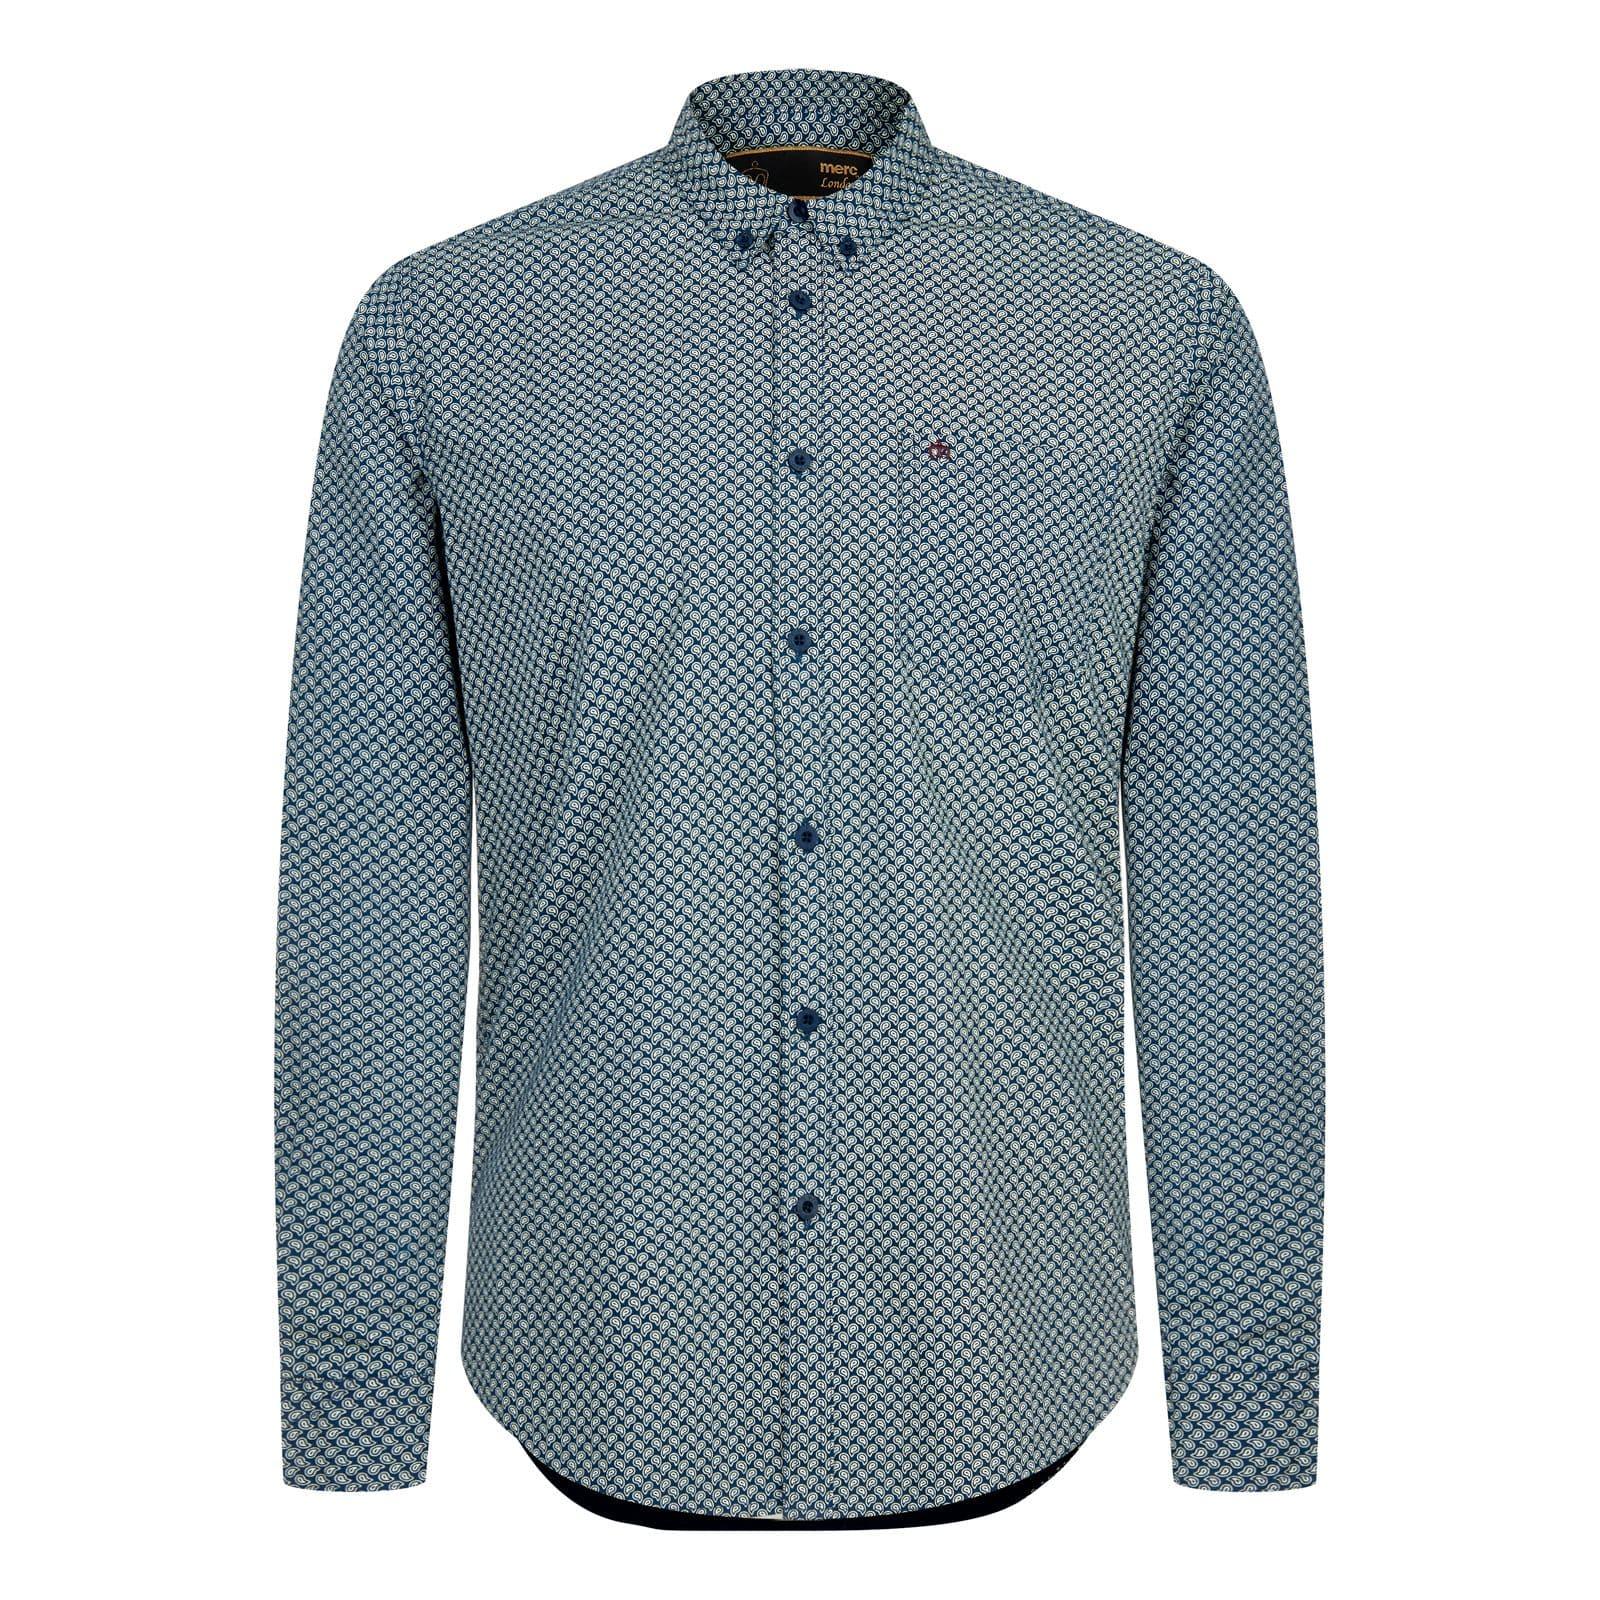 Рубашка HelmsleyРубашки под заказ<br><br><br>Артикул: 1516204<br>Материал: 100% хлопок<br>Цвет: синий<br>Пол: Мужской